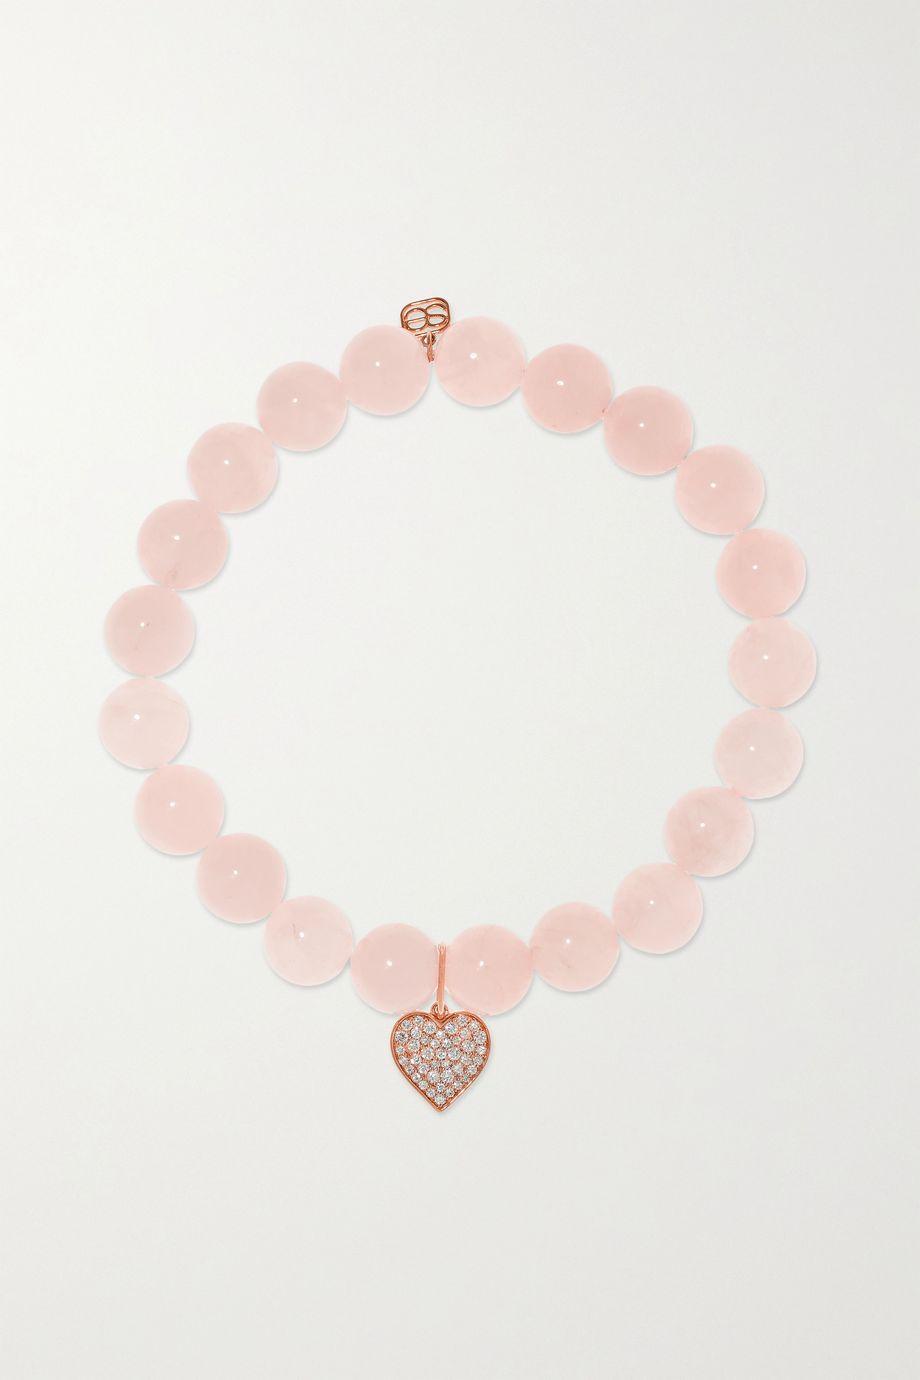 Sydney Evan Mini Heart 14-karat rose gold, quartz and diamond bracelet